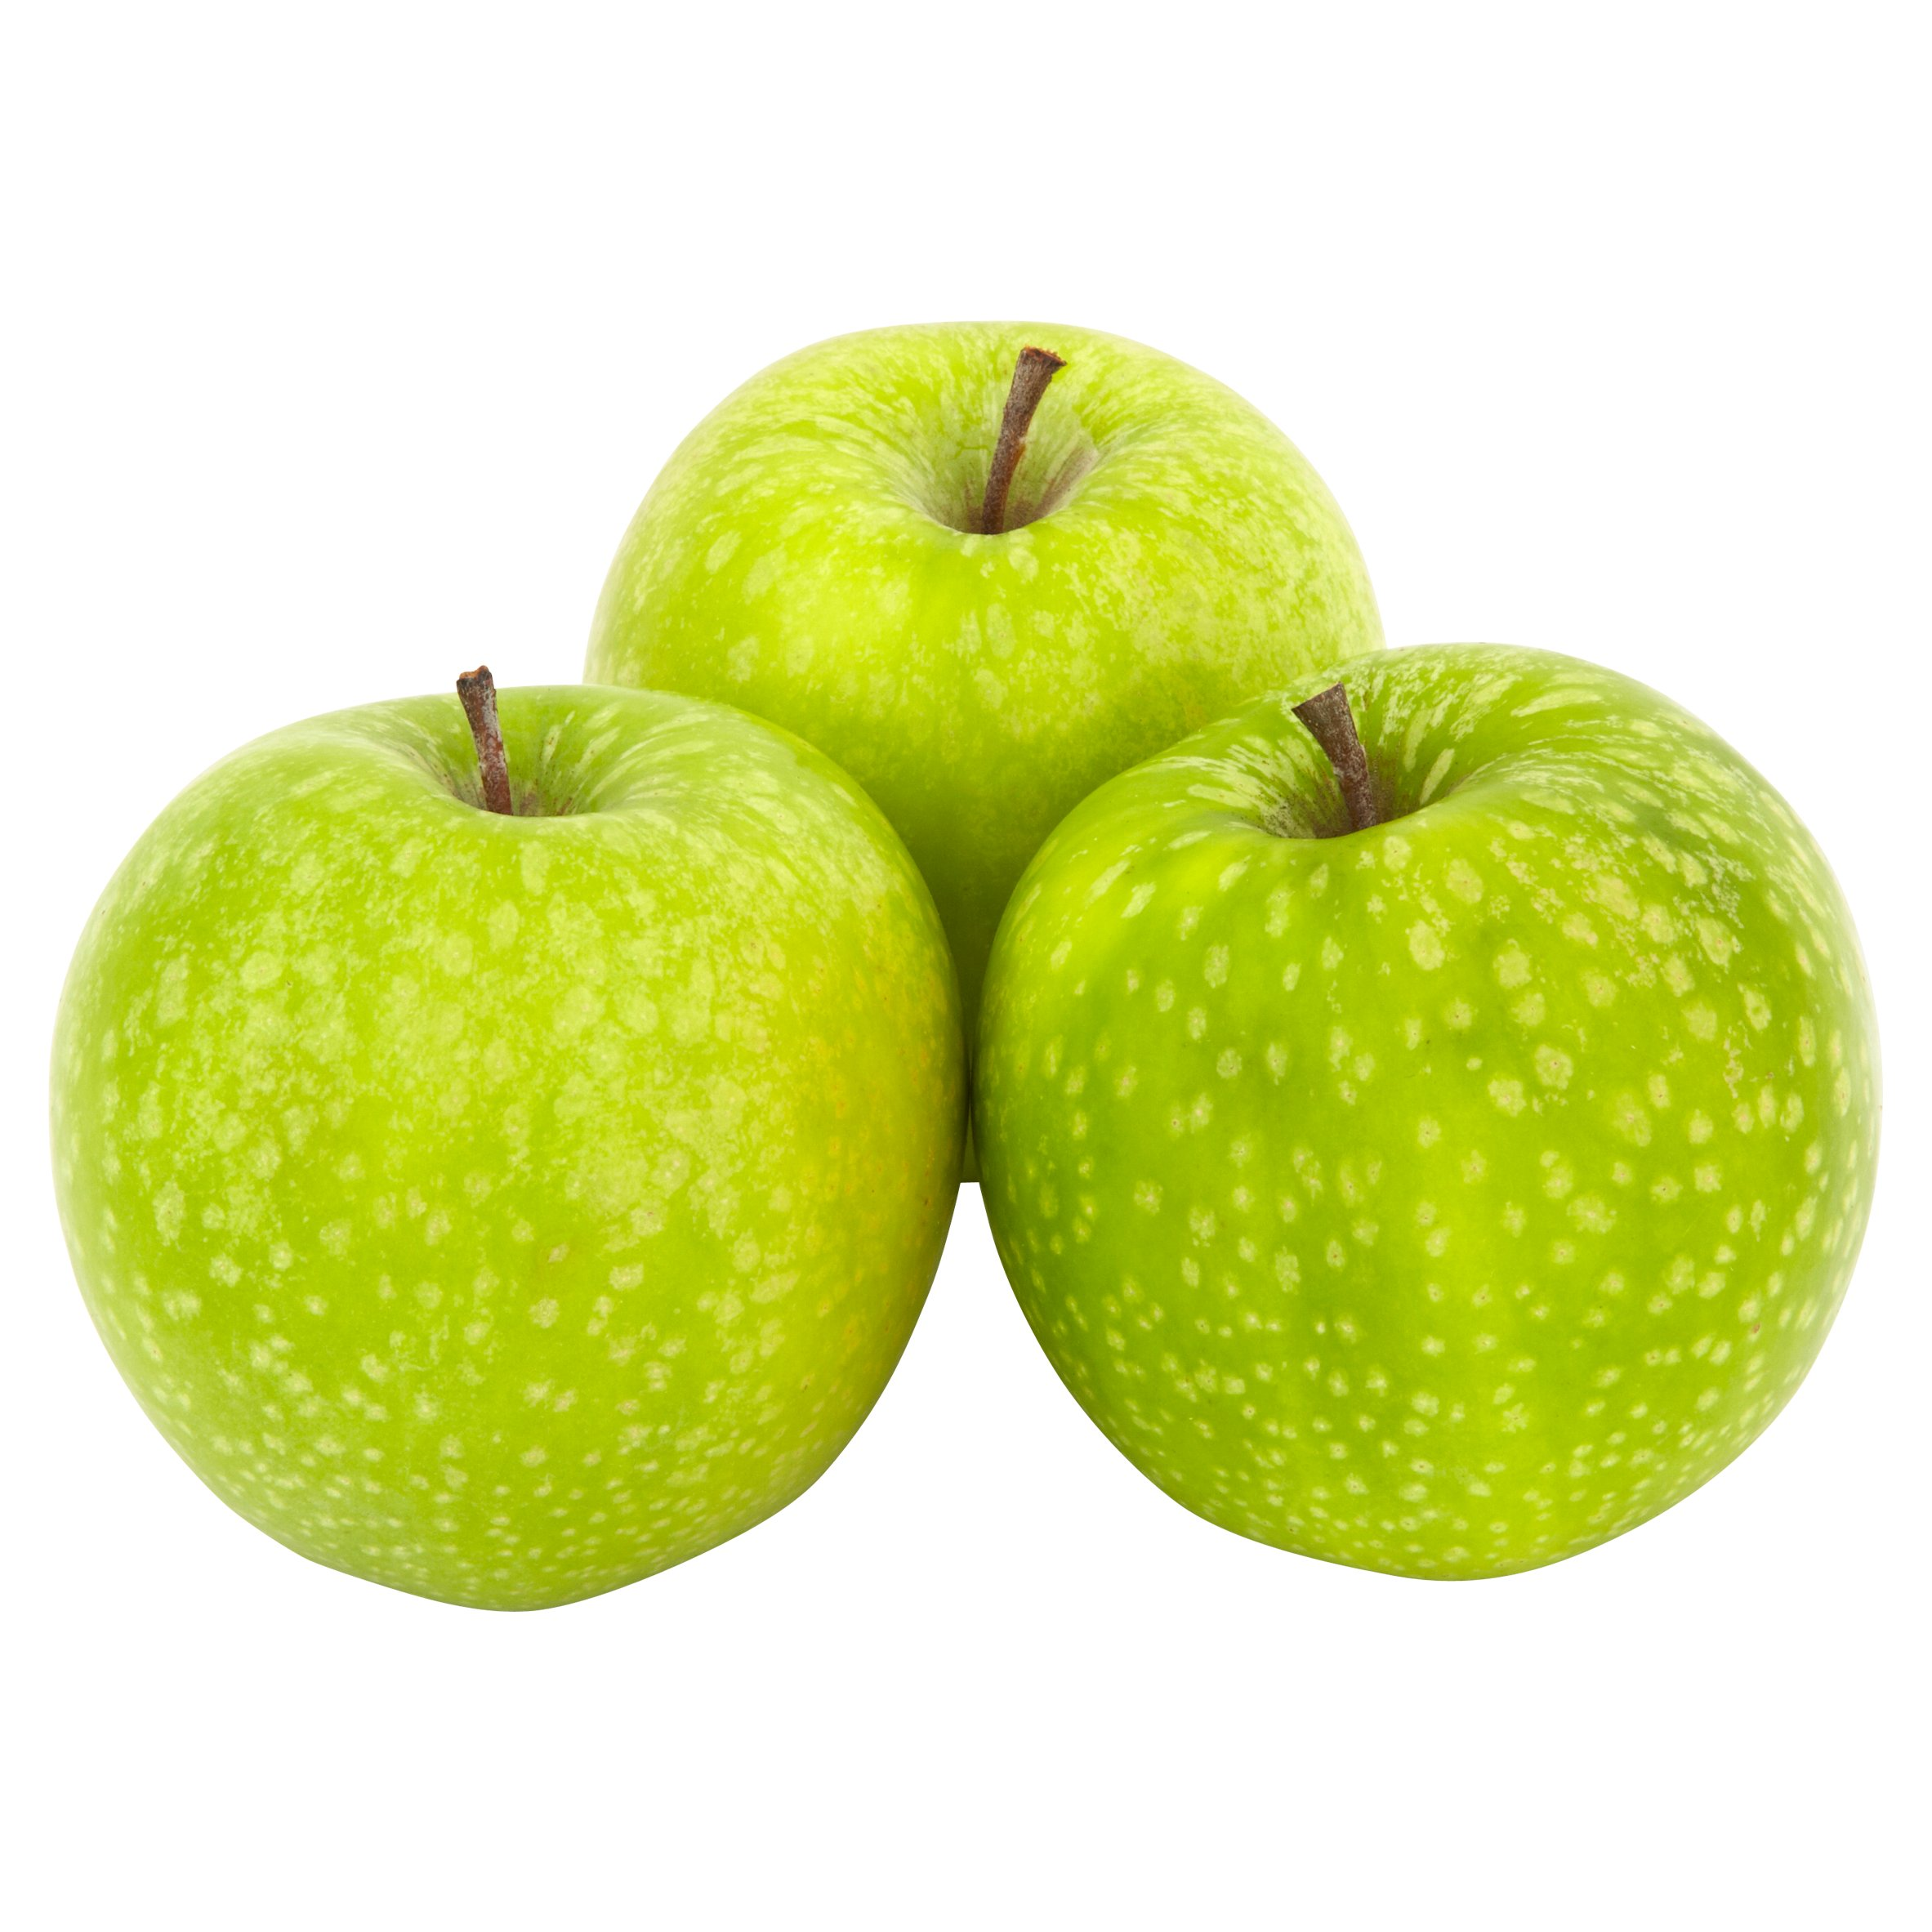 TESCO > Fresh Food > Granny Smith Apples Class 1 Loose